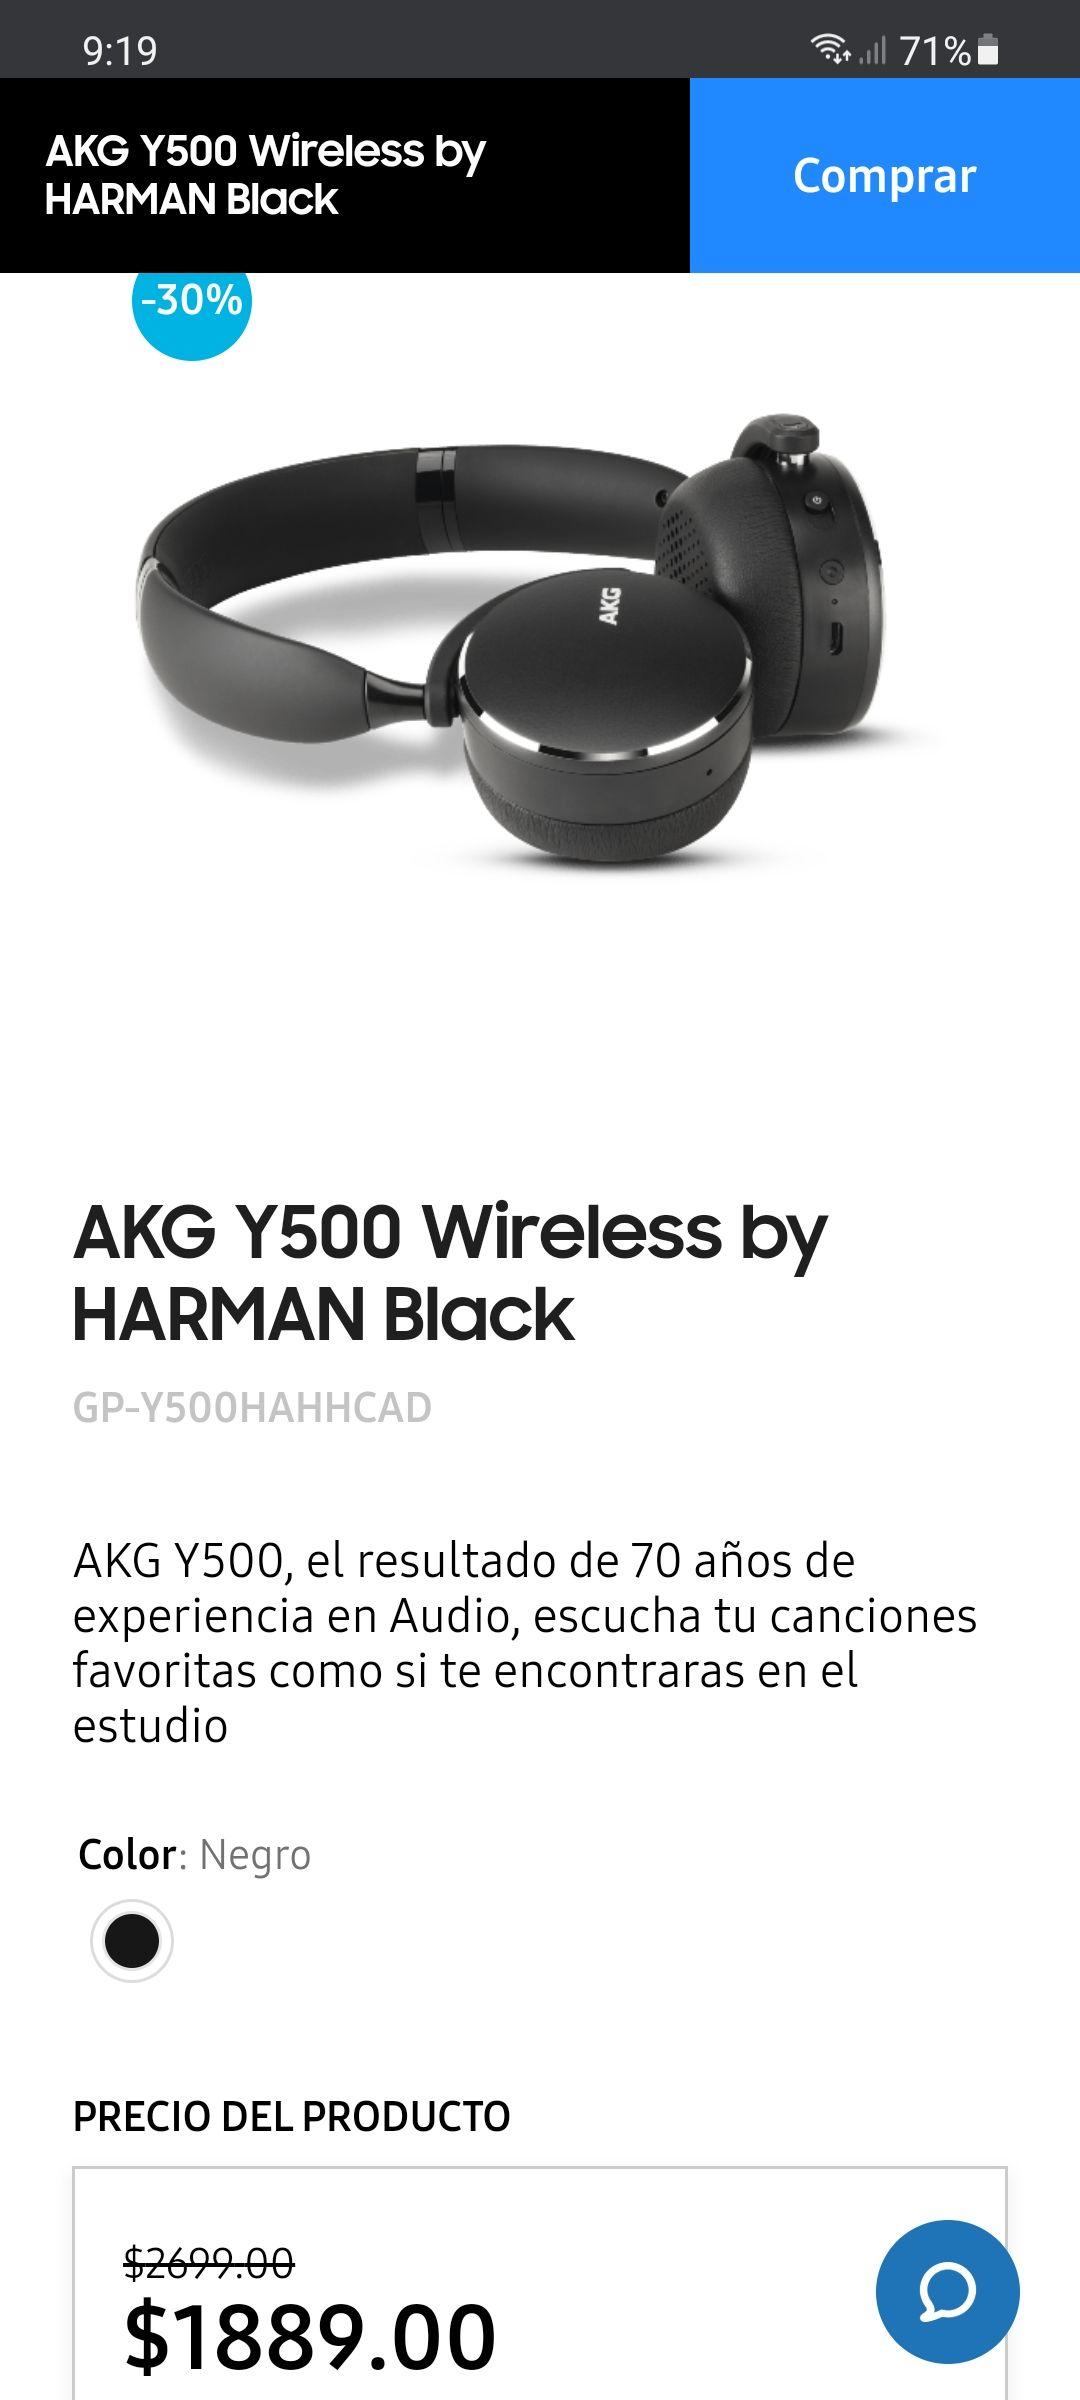 Samsung store, AKG Y500 Wireless by HARMAN Black